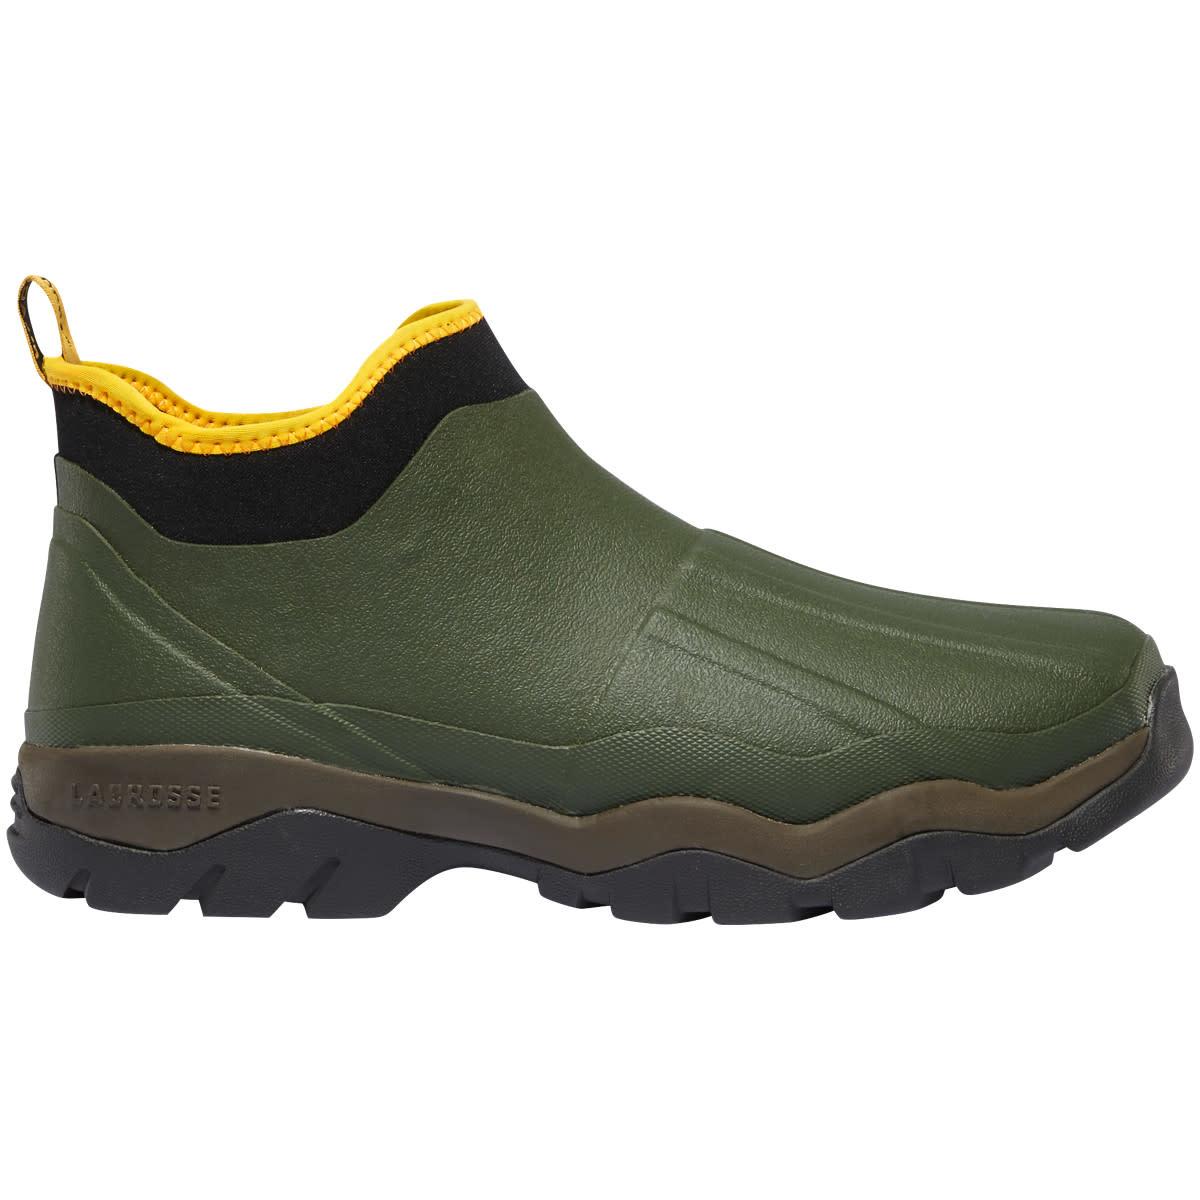 "Alpha Muddy 4.5"" Green-1"